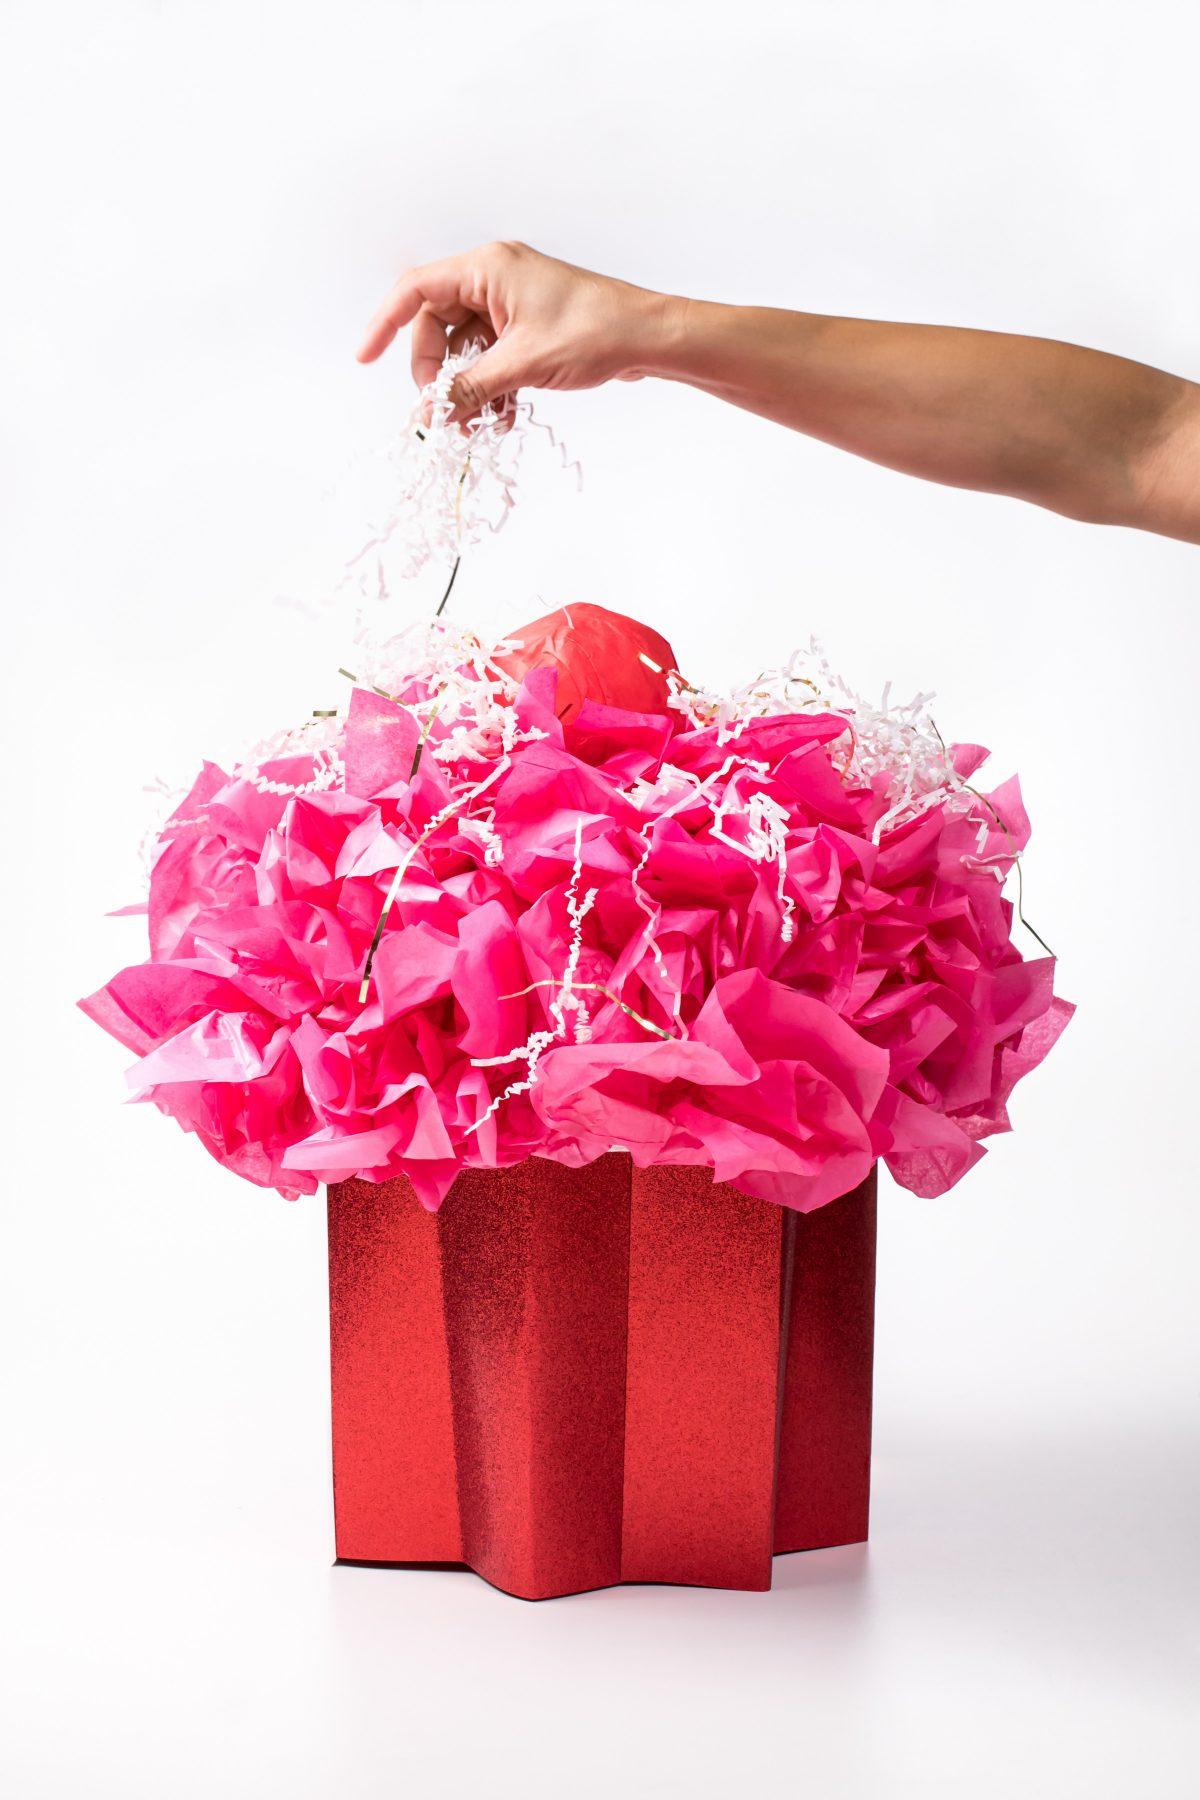 5D4B8248 - Cupcake Valentine Day Box - Add sprinkles